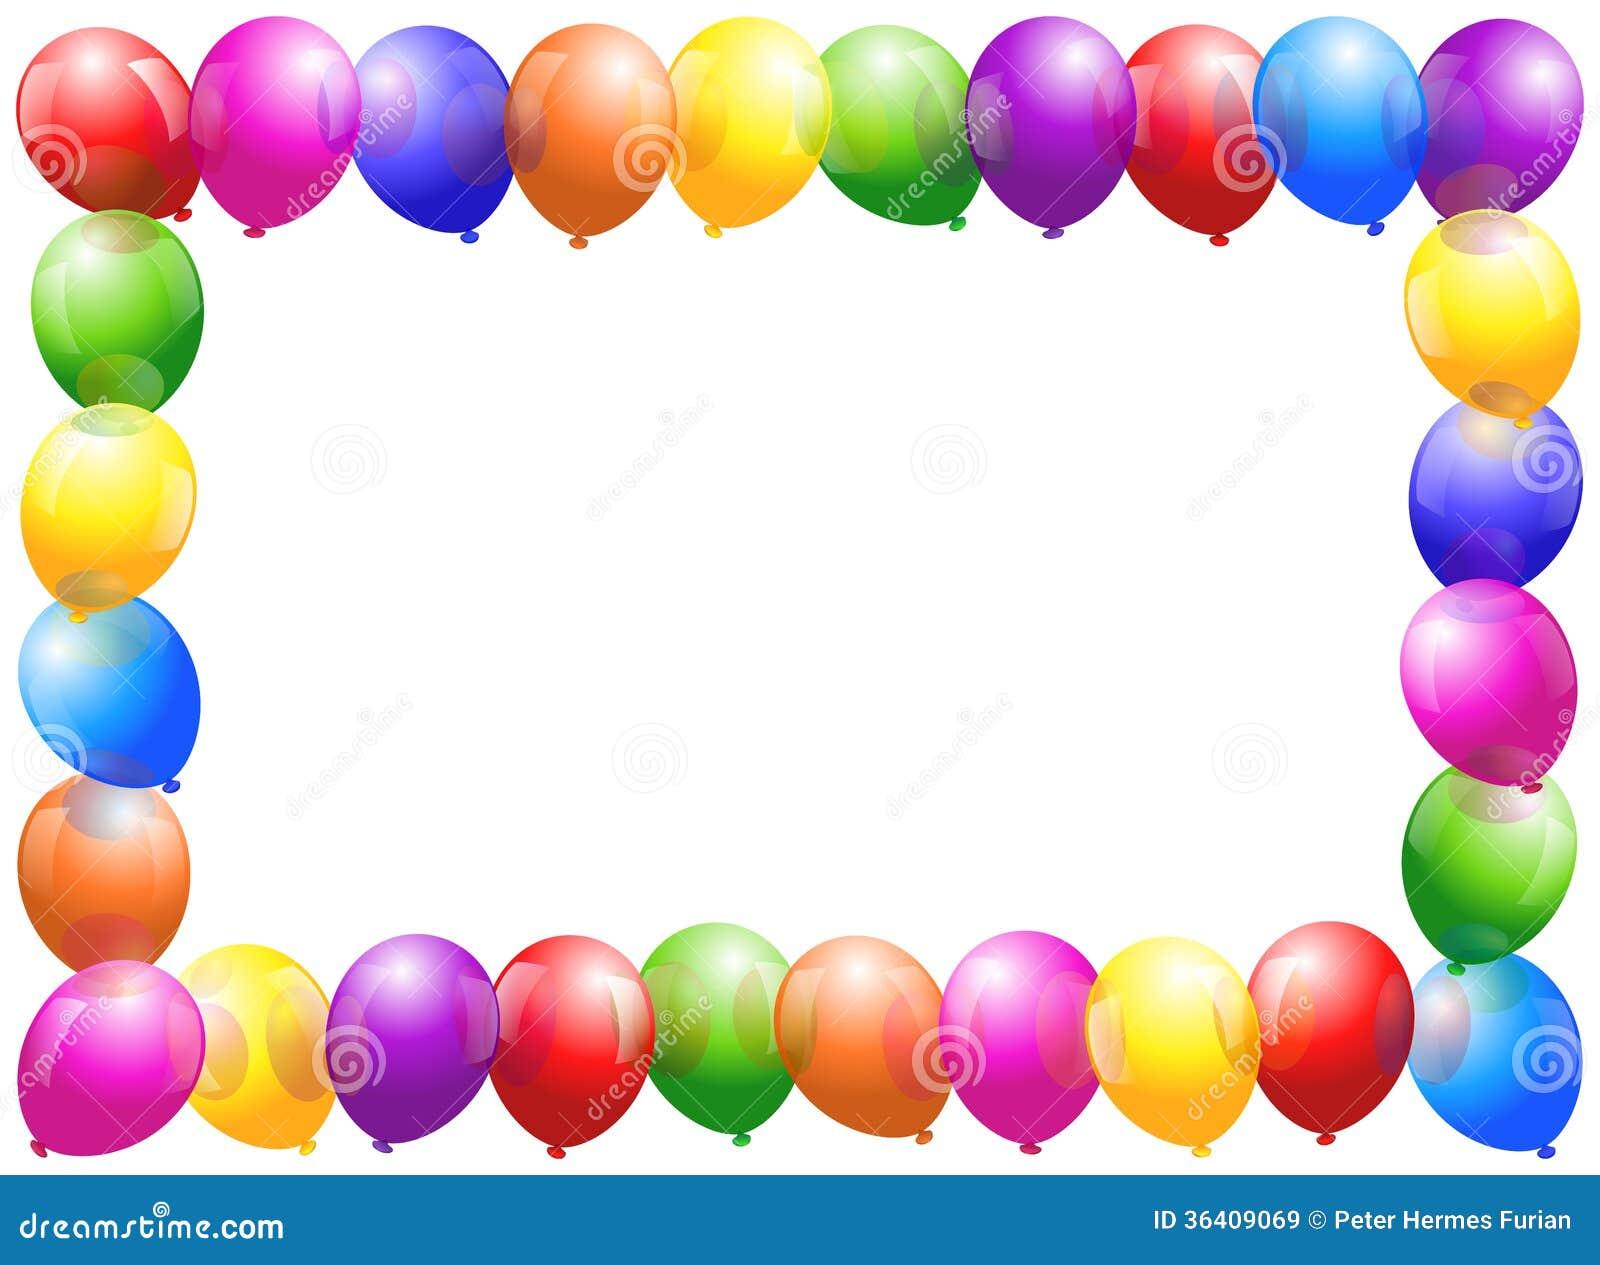 Ballon-Rahmen vektor abbildung. Illustration von fall - 36409069